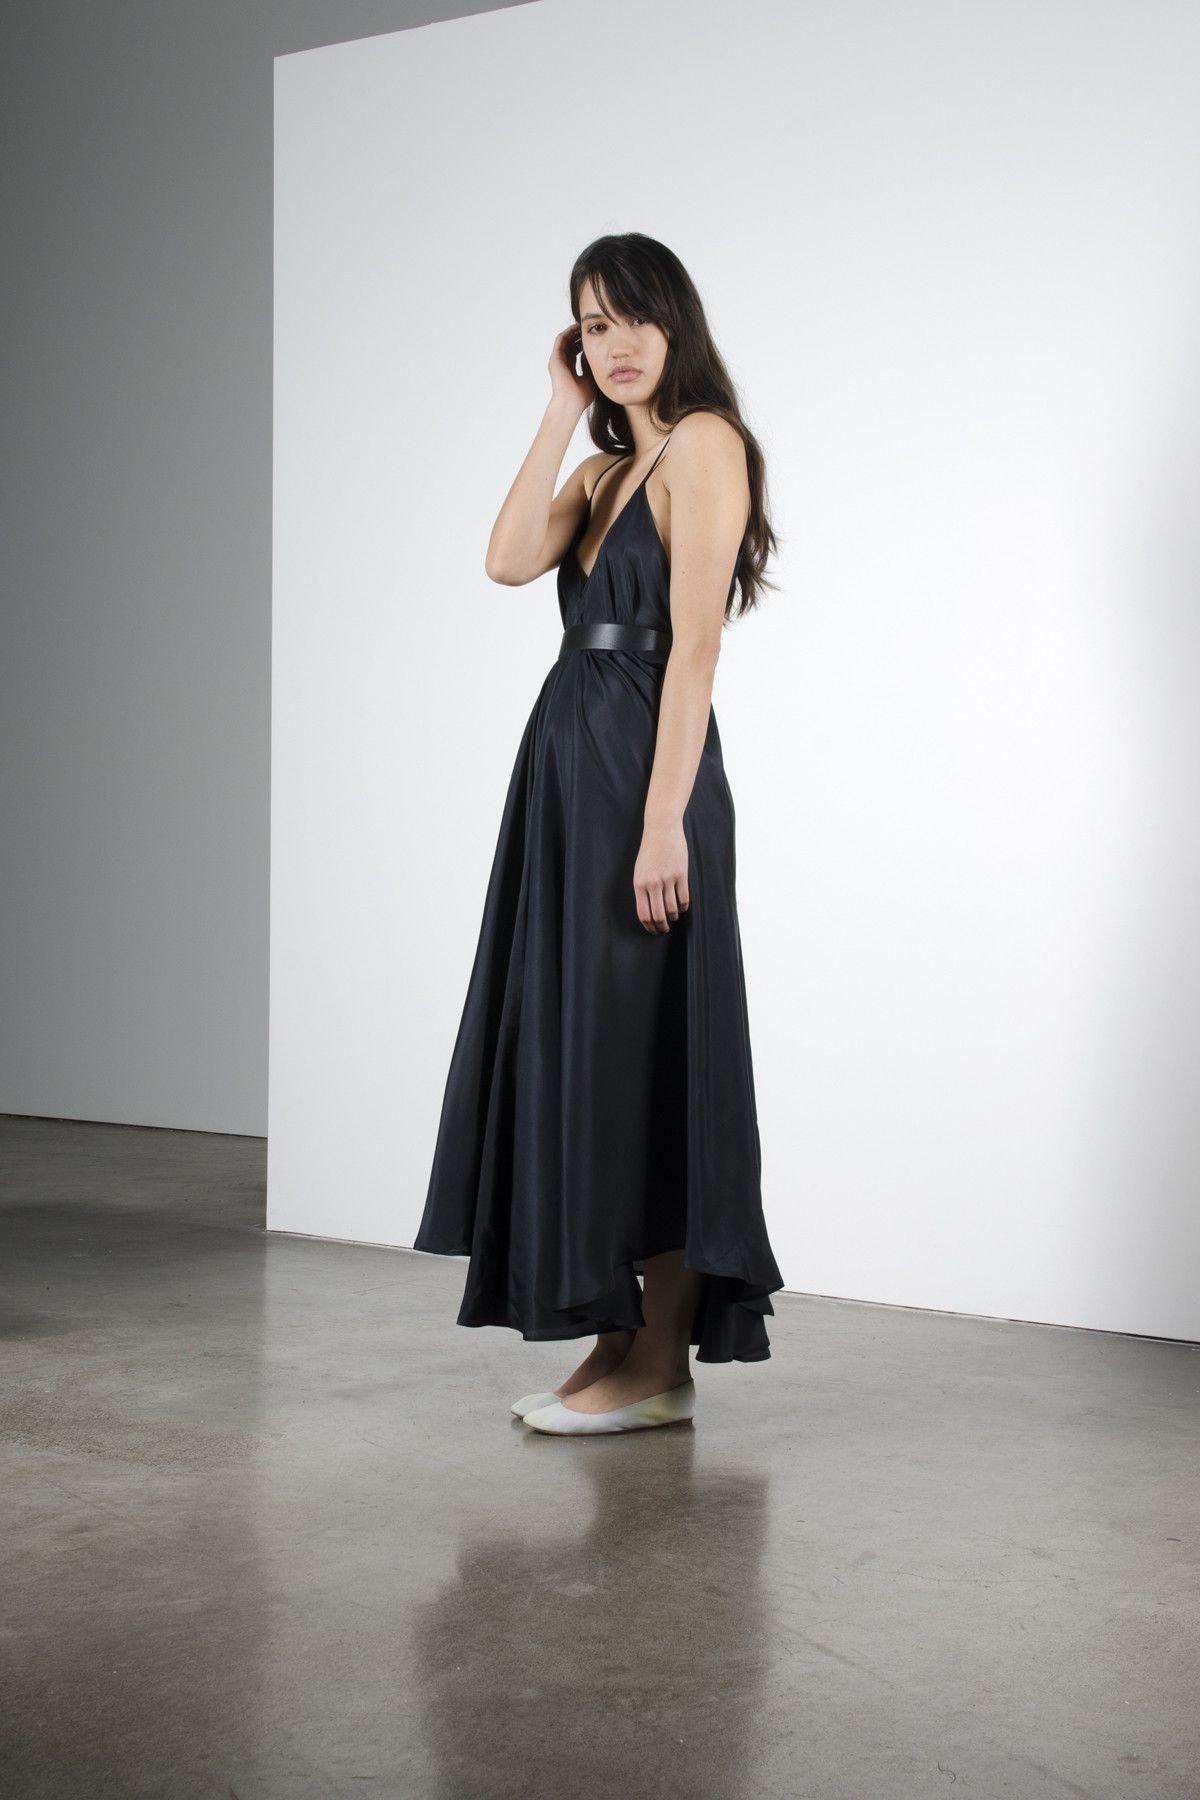 Julee Cruise Dress Black Cruise Dress Dresses Black Dress